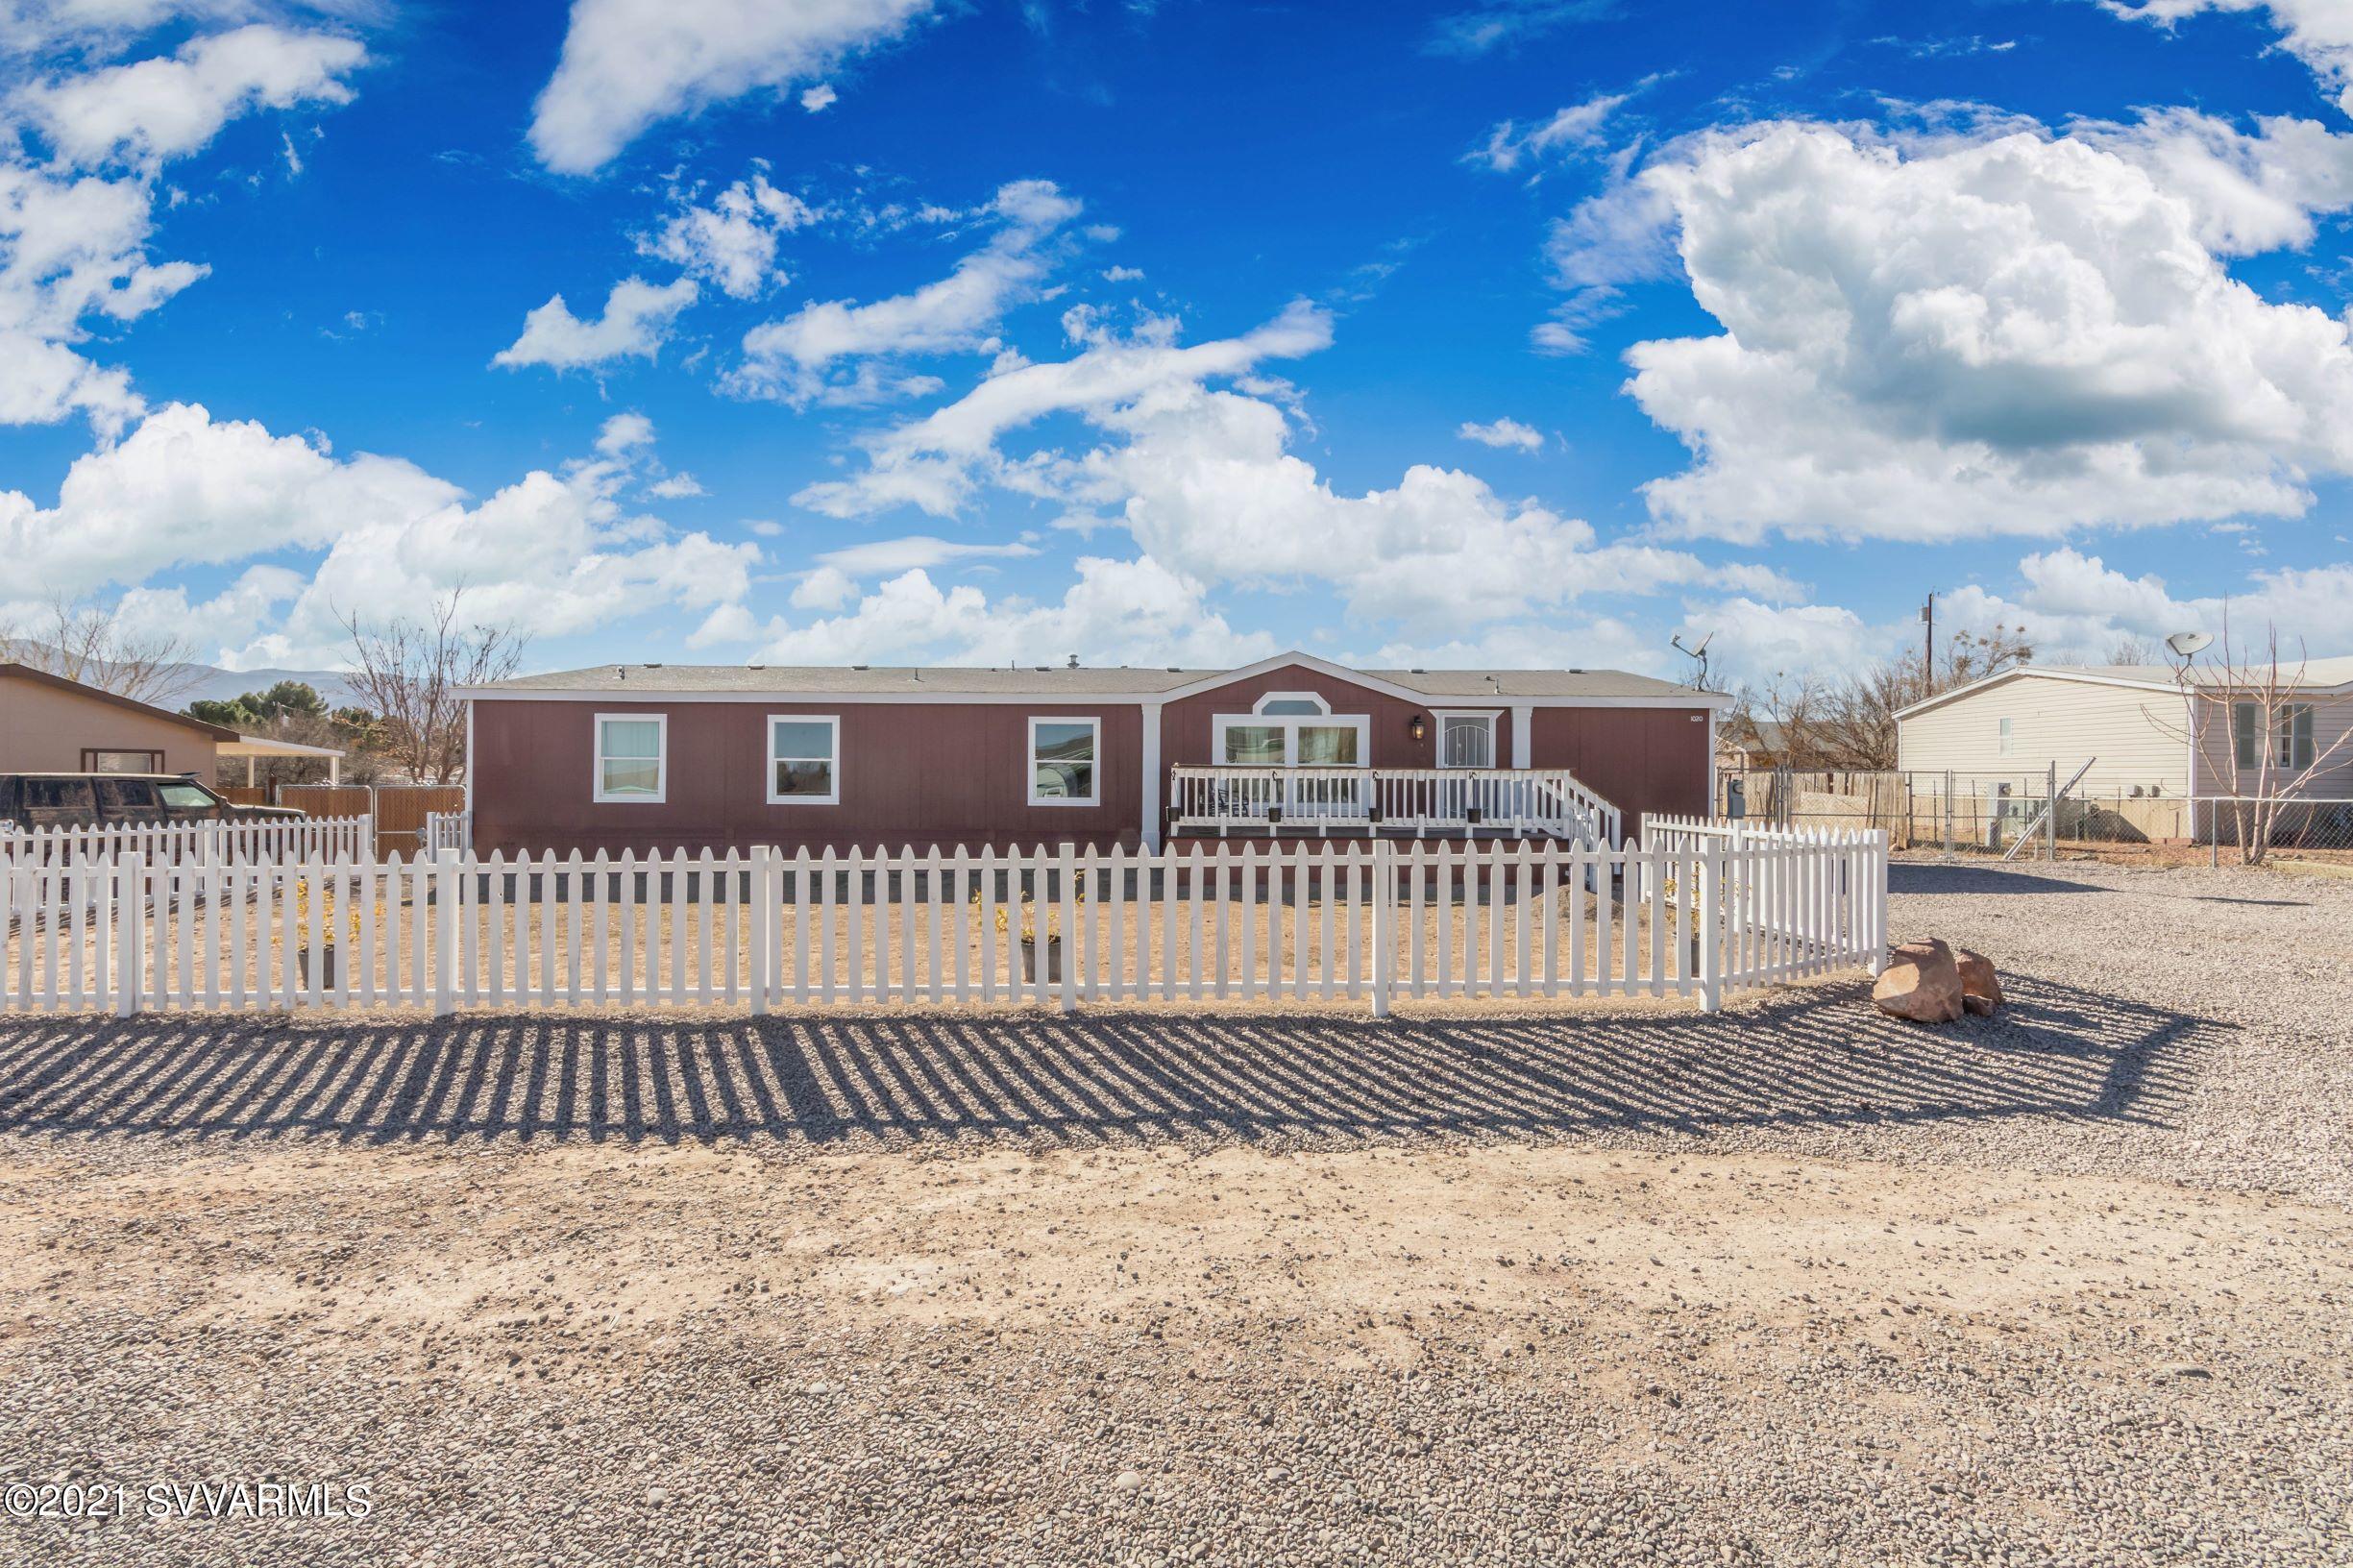 1020 S Territory Tr Cottonwood, AZ 86326